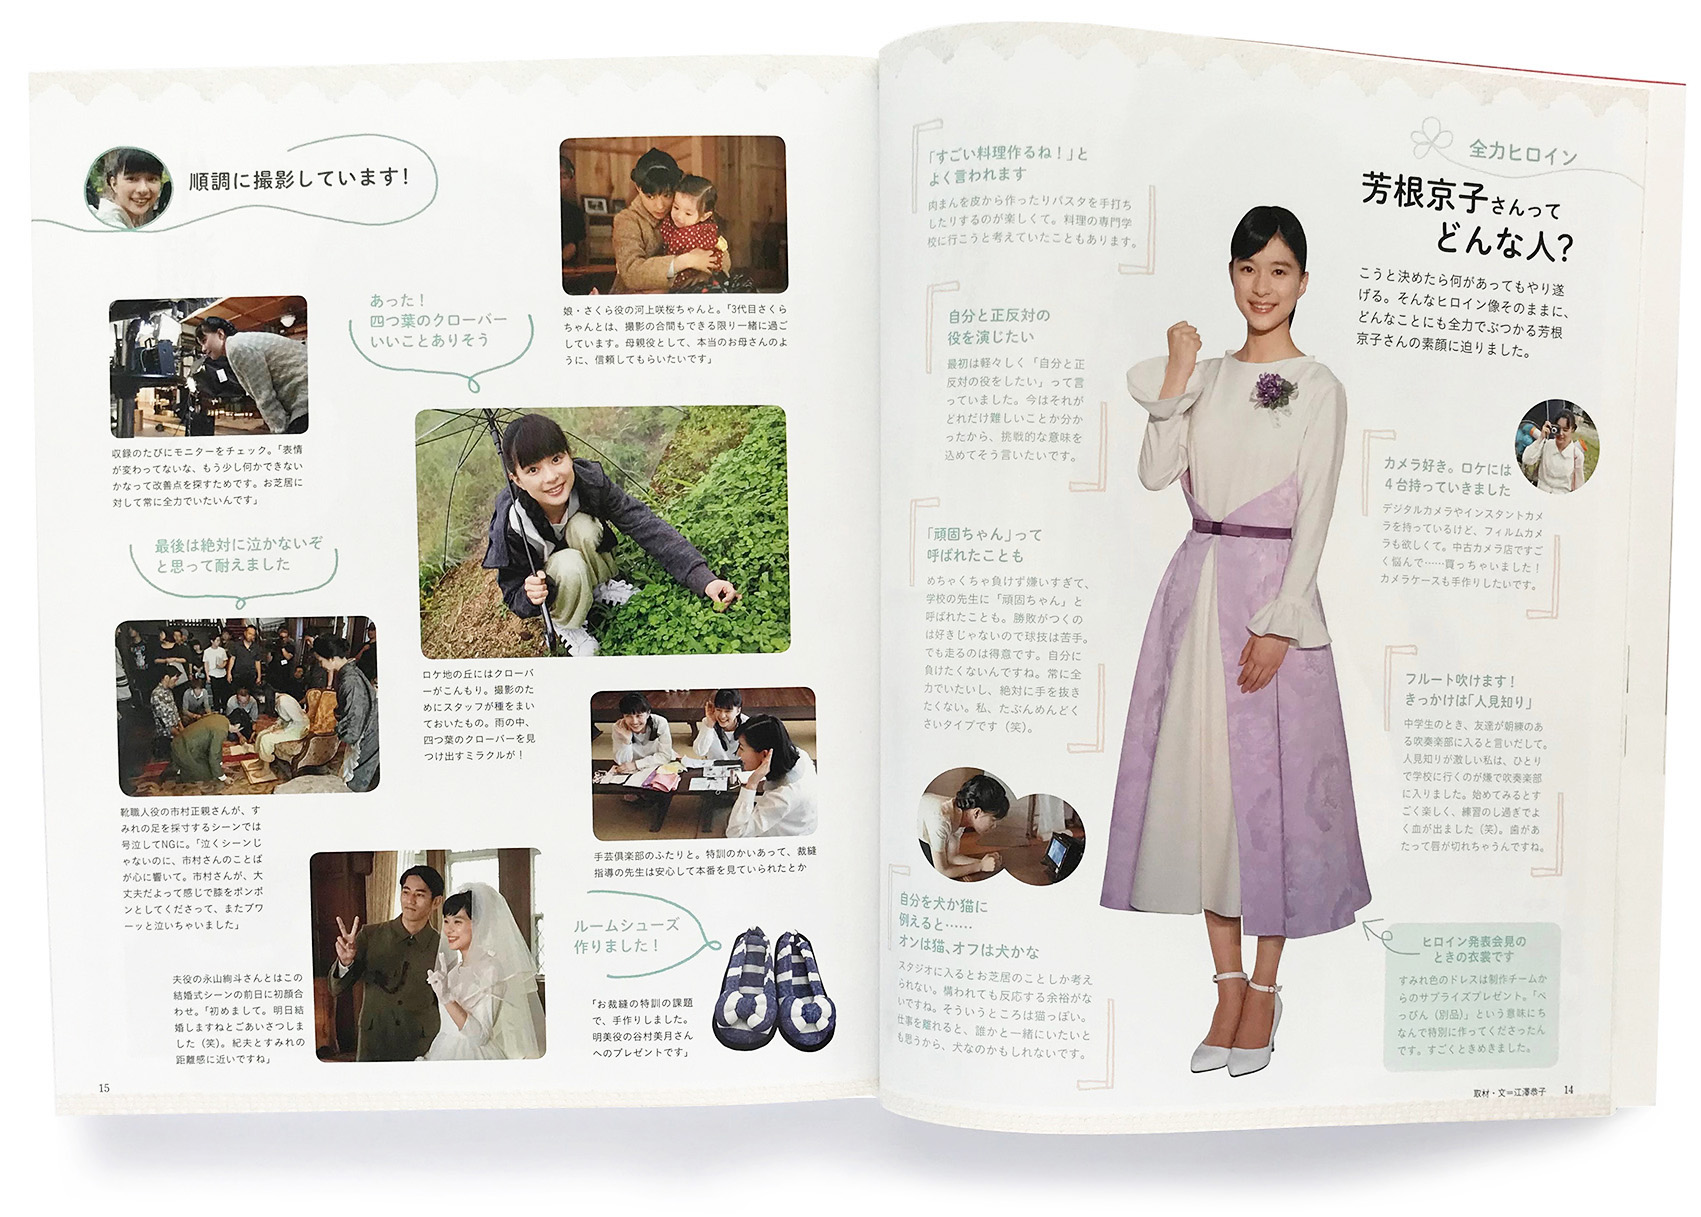 NHKドラマ・ガイド『連続テレビ小説 べっぴんさん』 2